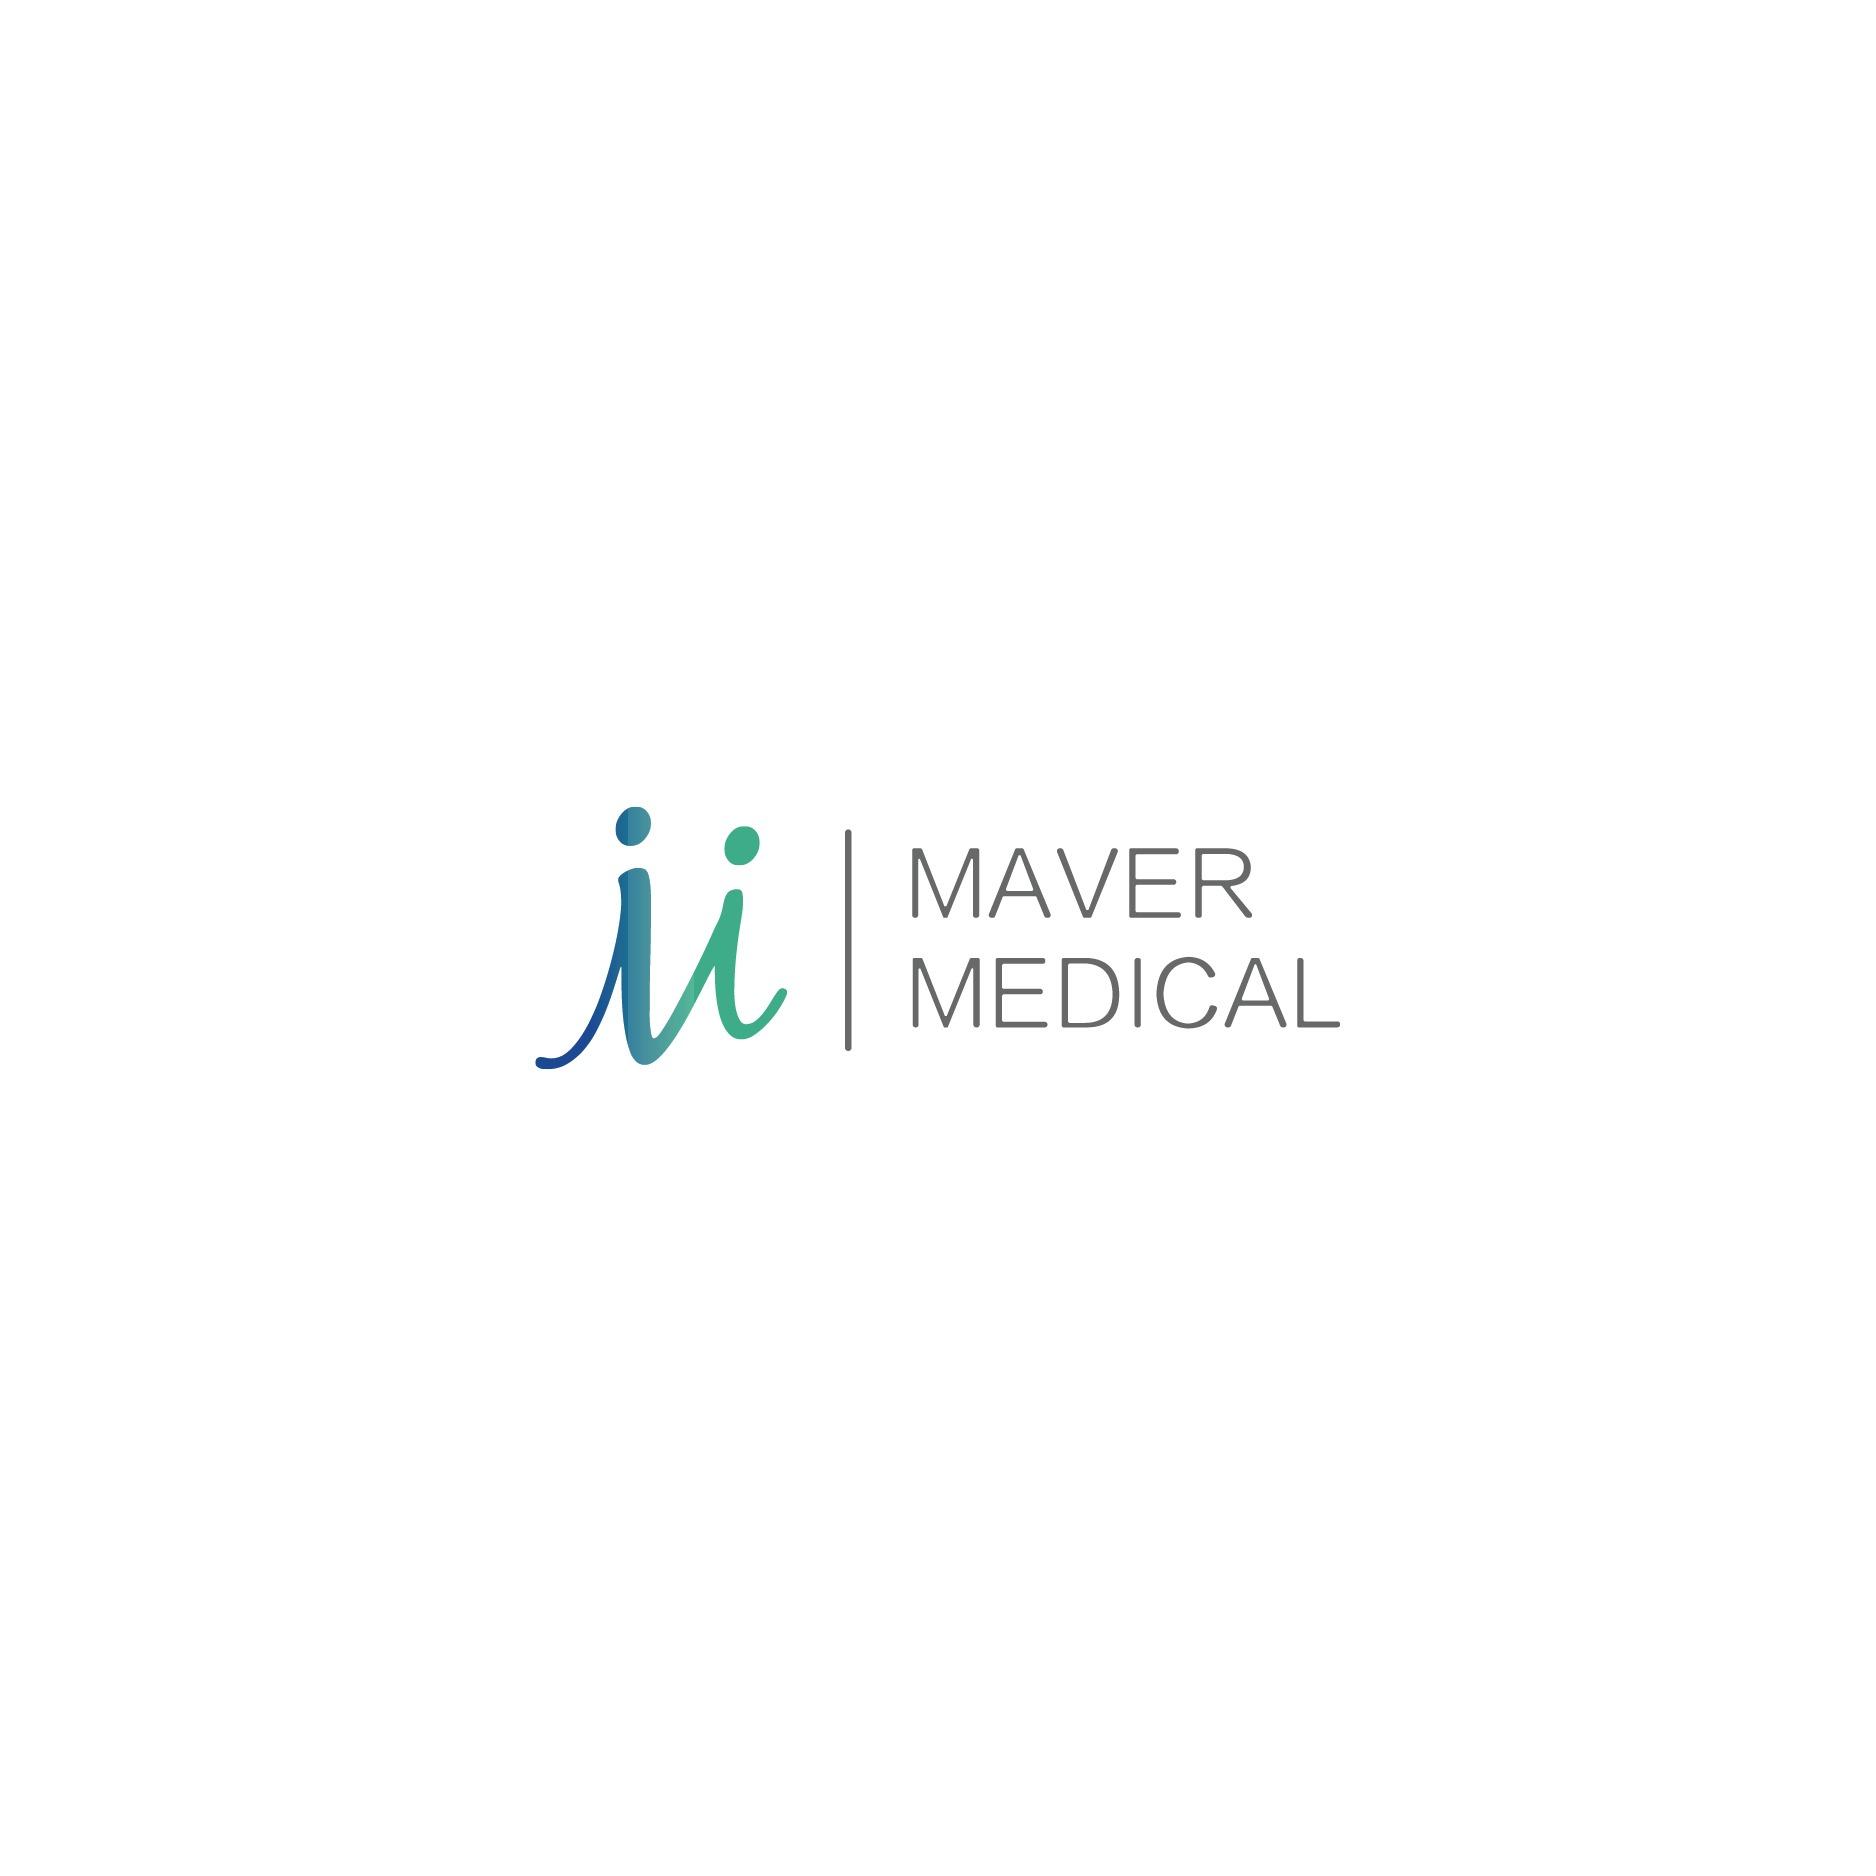 Maver Medical